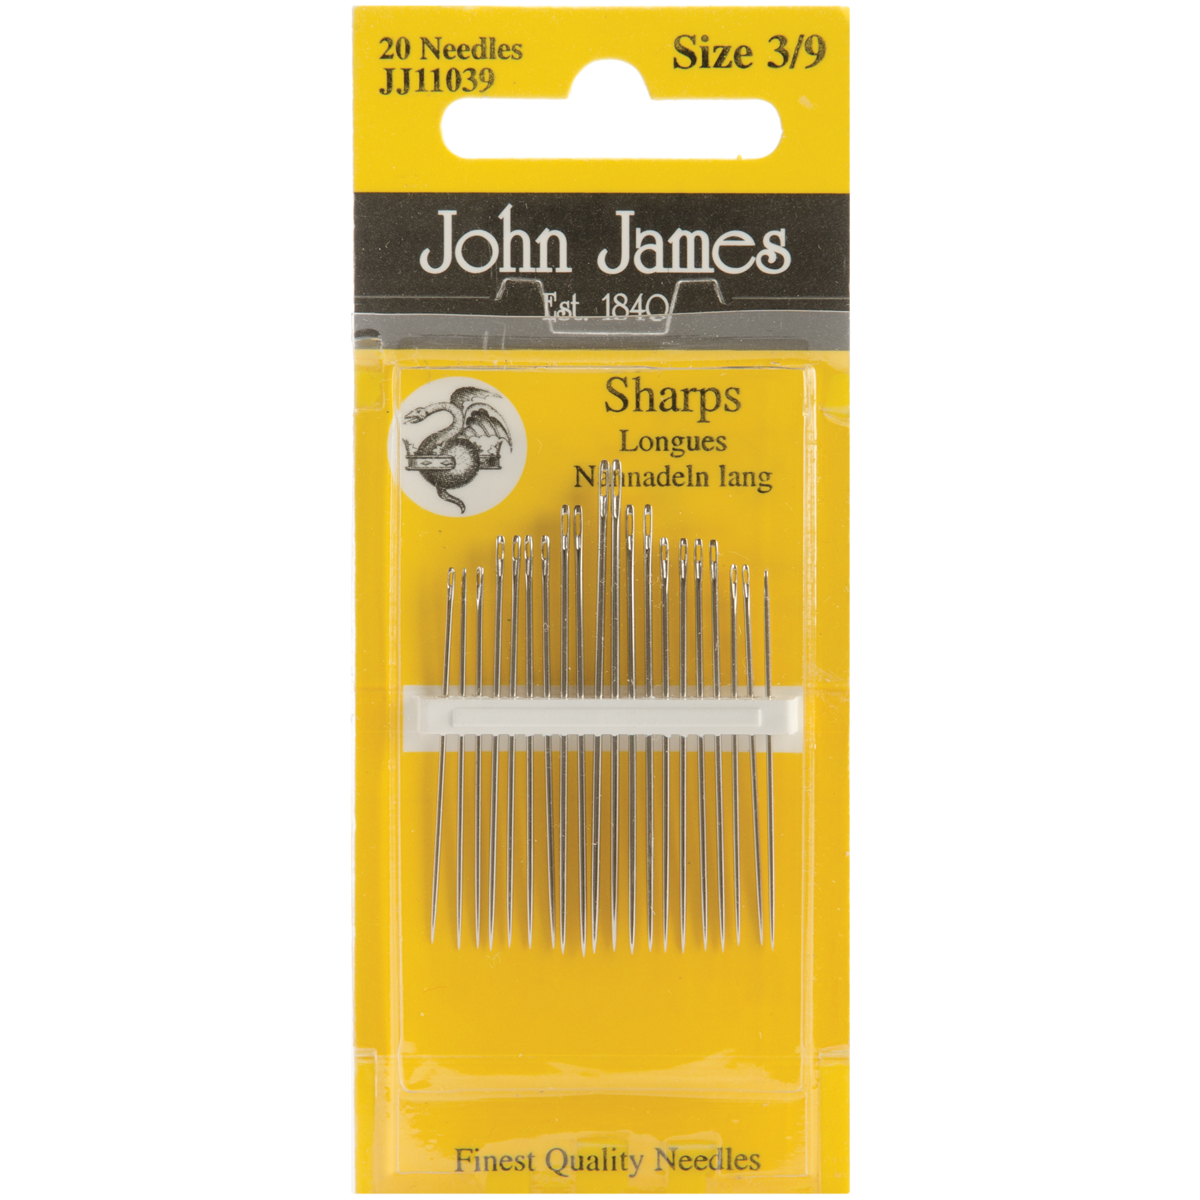 John James Sharps Hand Needles-Size 3/9 20/Pkg